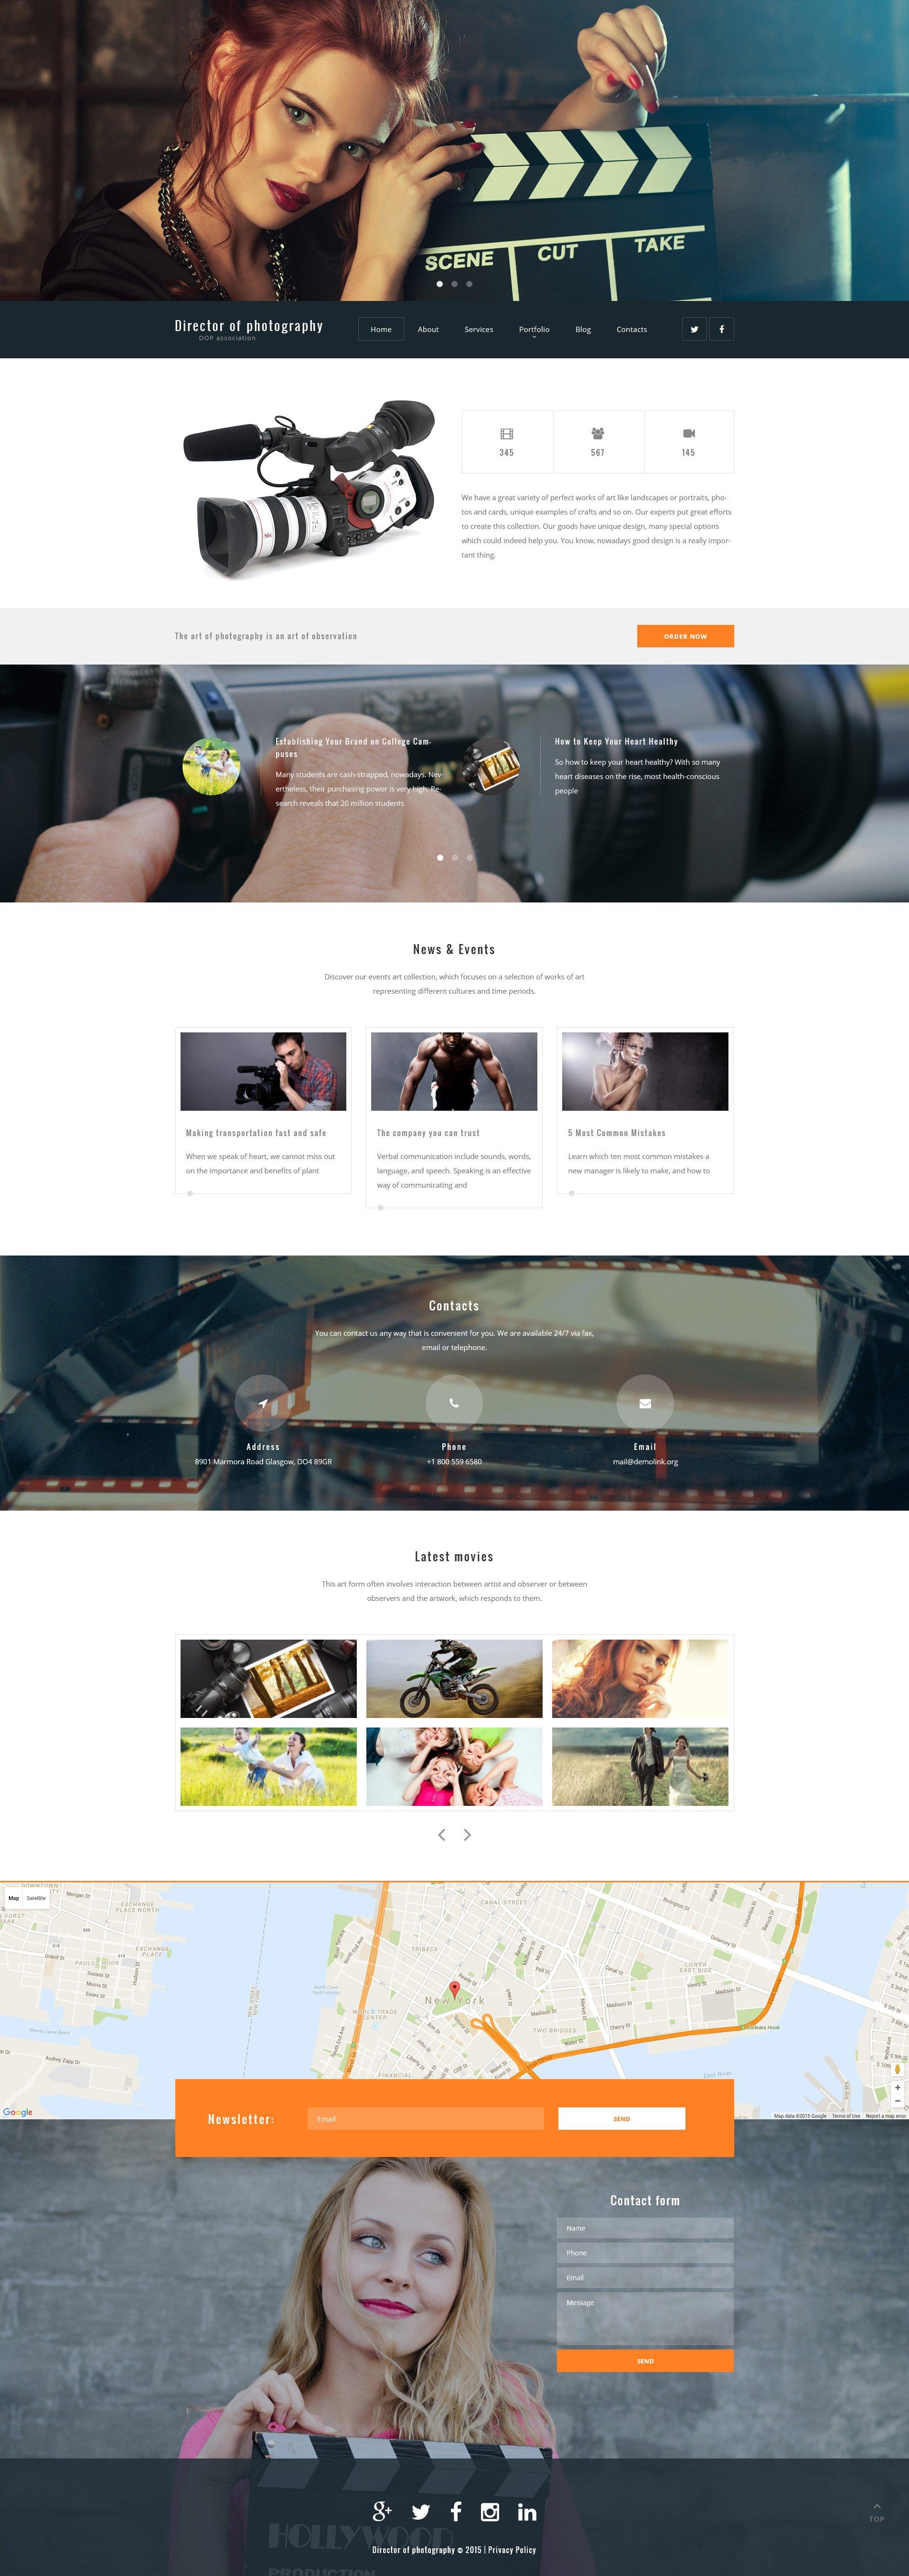 """Director of Photography"" - адаптивний WordPress шаблон №55962 - скріншот"